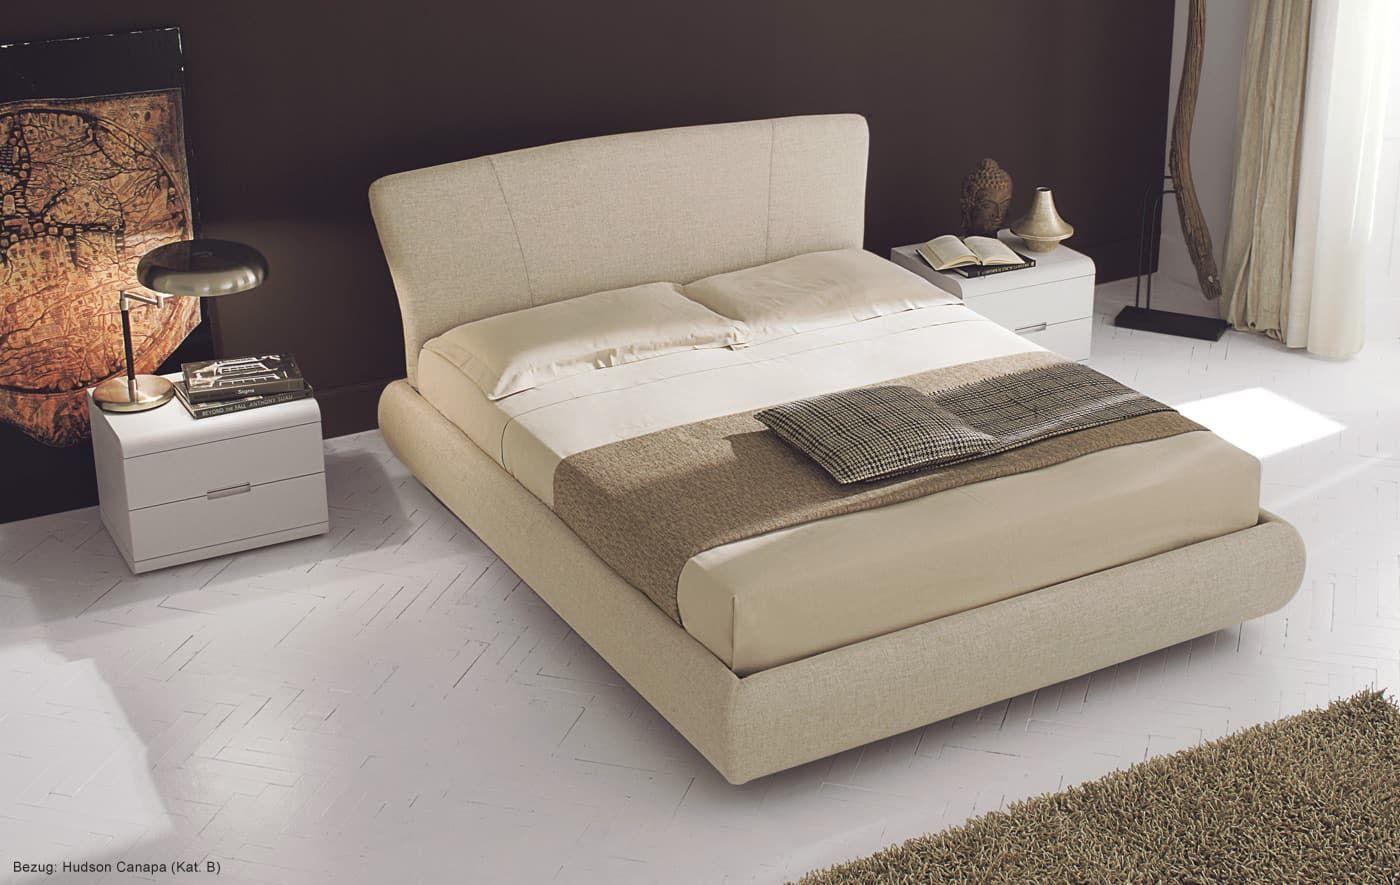 Polsterbett Bamba Classic Stoff Polsterbett Bett Schlafzimmermobel